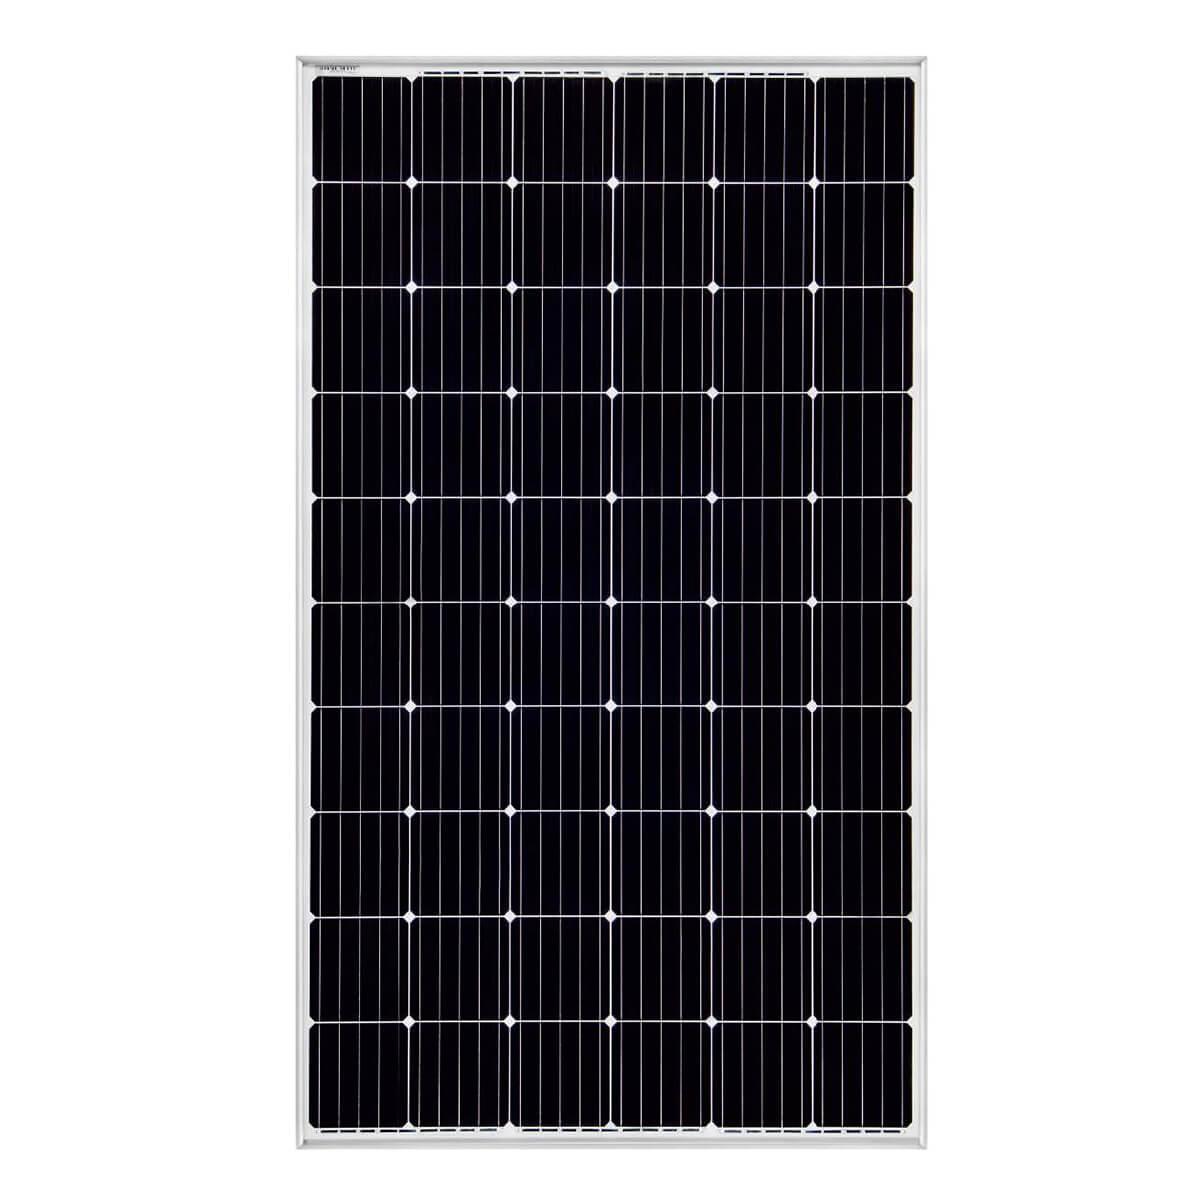 Odul solar 300W panel, odul solar 300Watt panel, Odul solar 300 W panel, odul solar 300 Watt panel, odul solar 300 Watt monokristal panel, Odul solar 300 W watt gunes paneli, odul solar 300 W watt monokristal gunes paneli, odul solar 300 W Watt fotovoltaik monokristal solar panel, odul solar 300W monokristal gunes enerjisi, odul solar OSM60-300W panel, ÖDÜL SOLAR 300 WATT